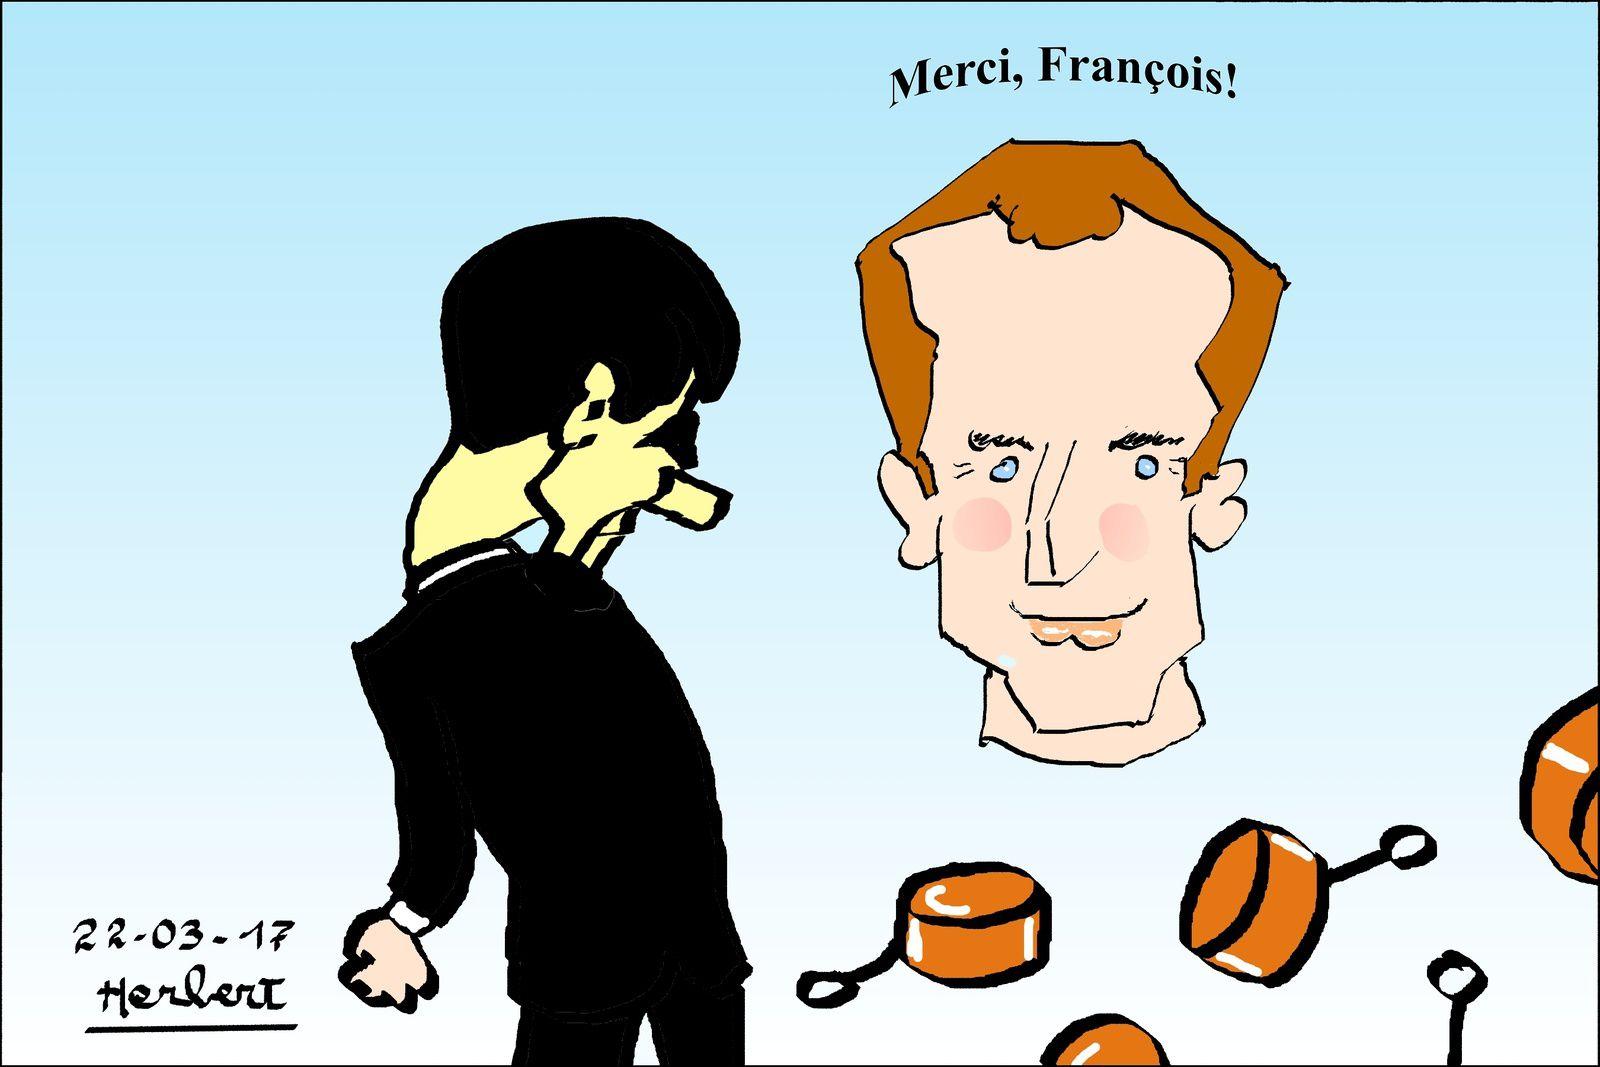 Macron, merci François!